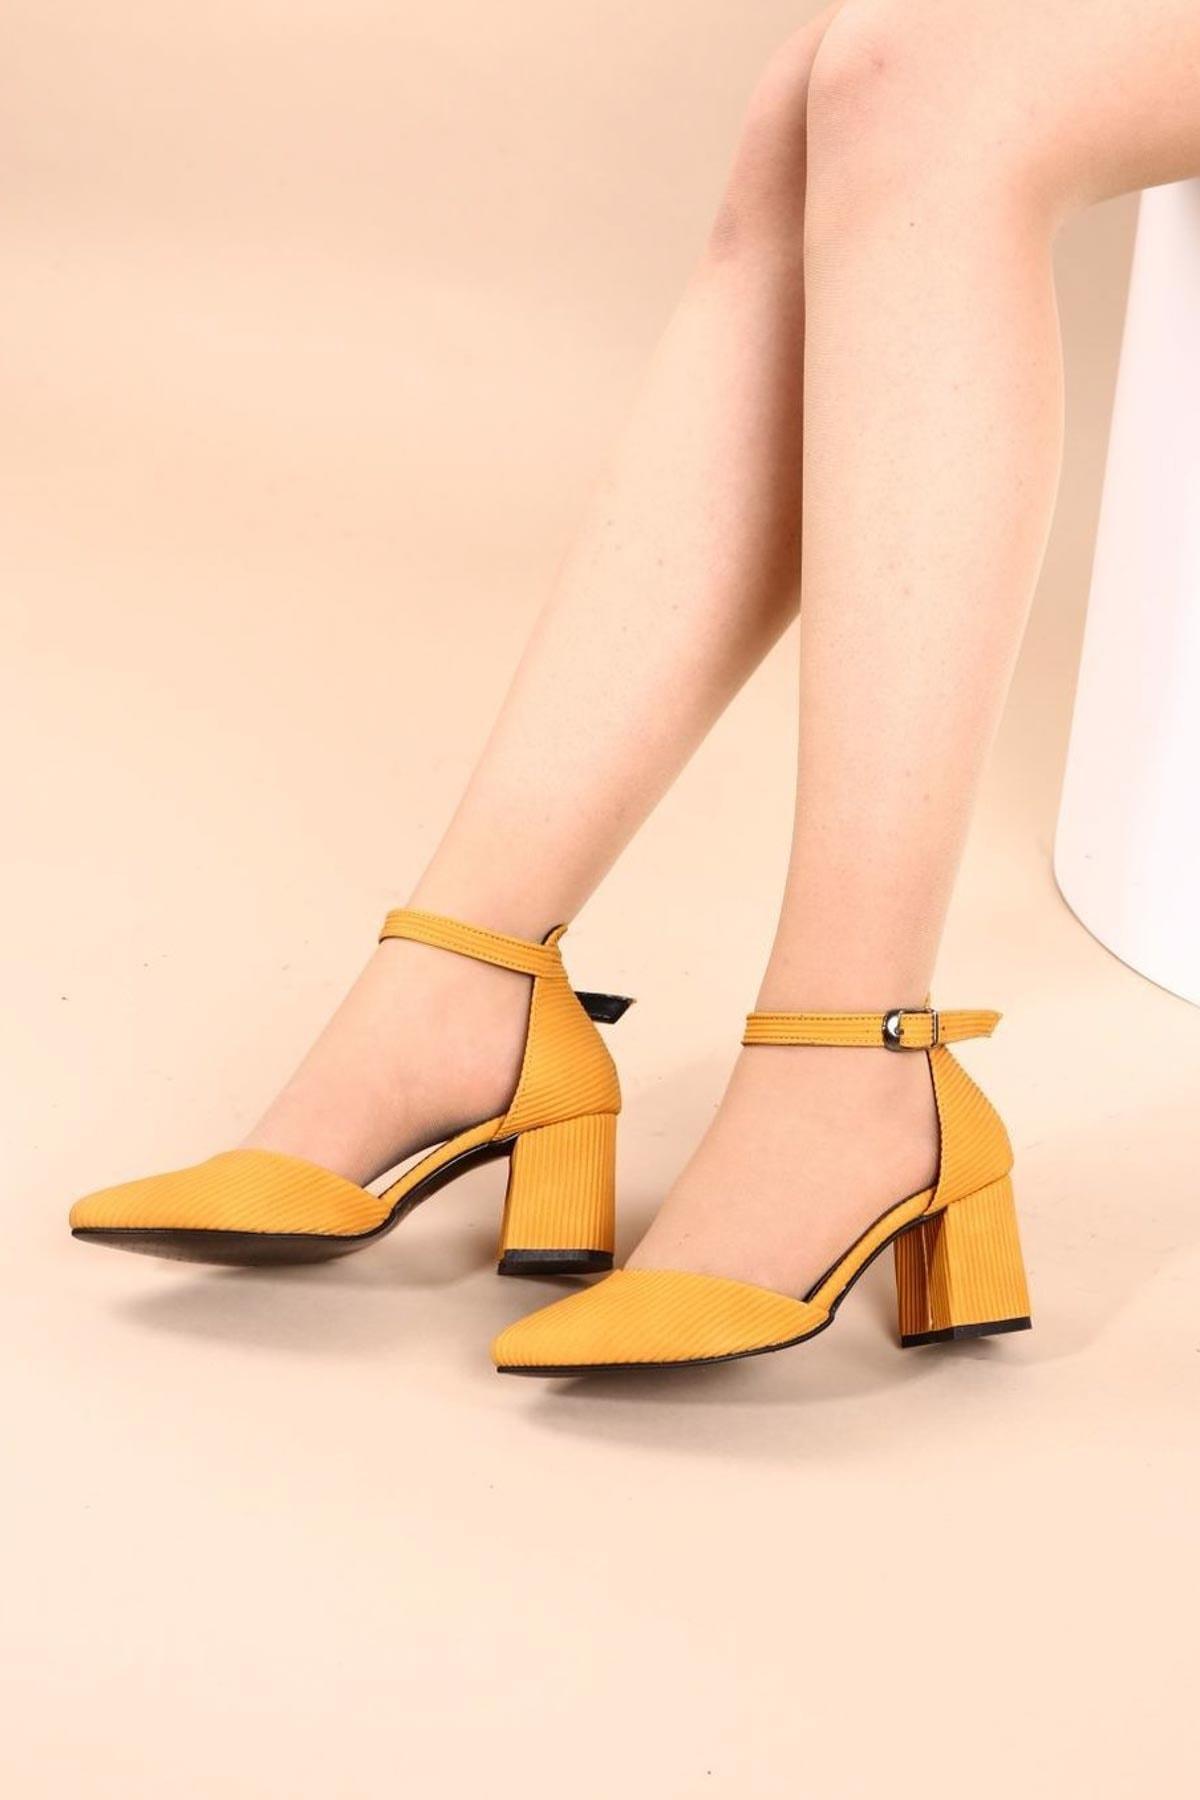 Hepfit Siyah Rugan Kadın Topuklu Ayakkabı